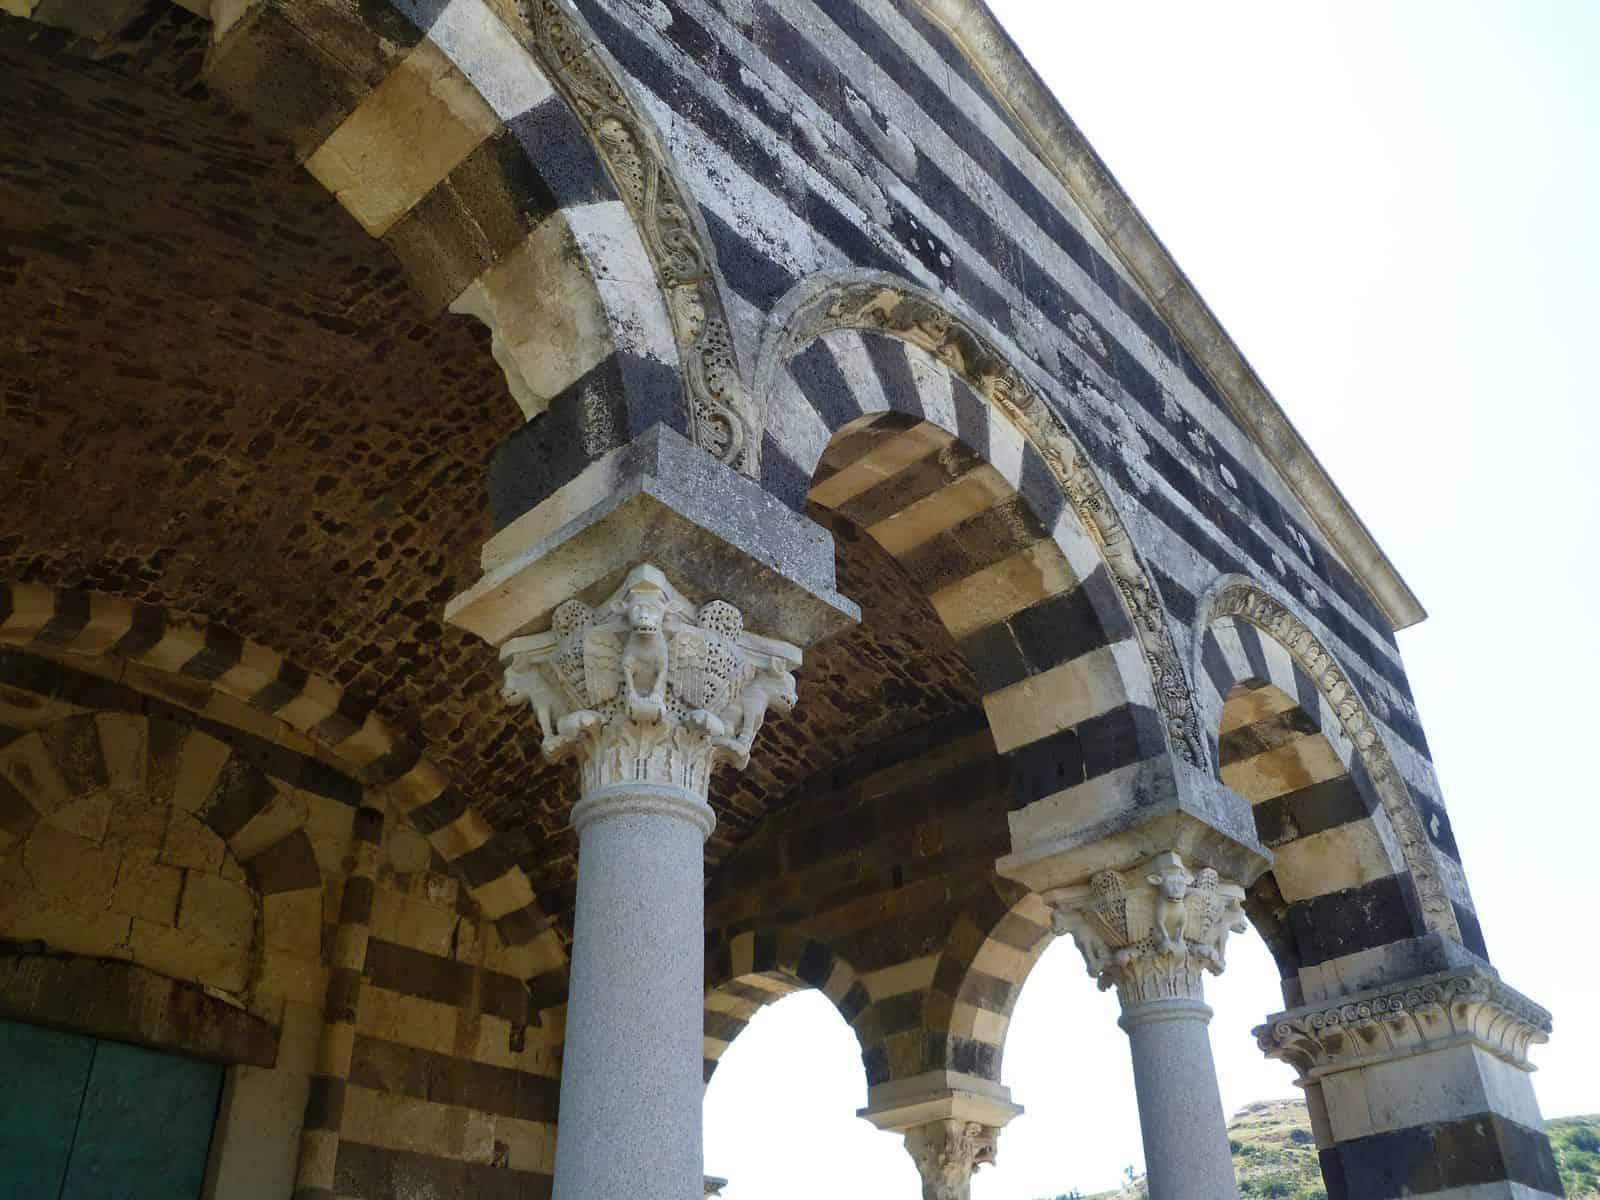 basilica_saccargia_sassari_sardegna_colonne